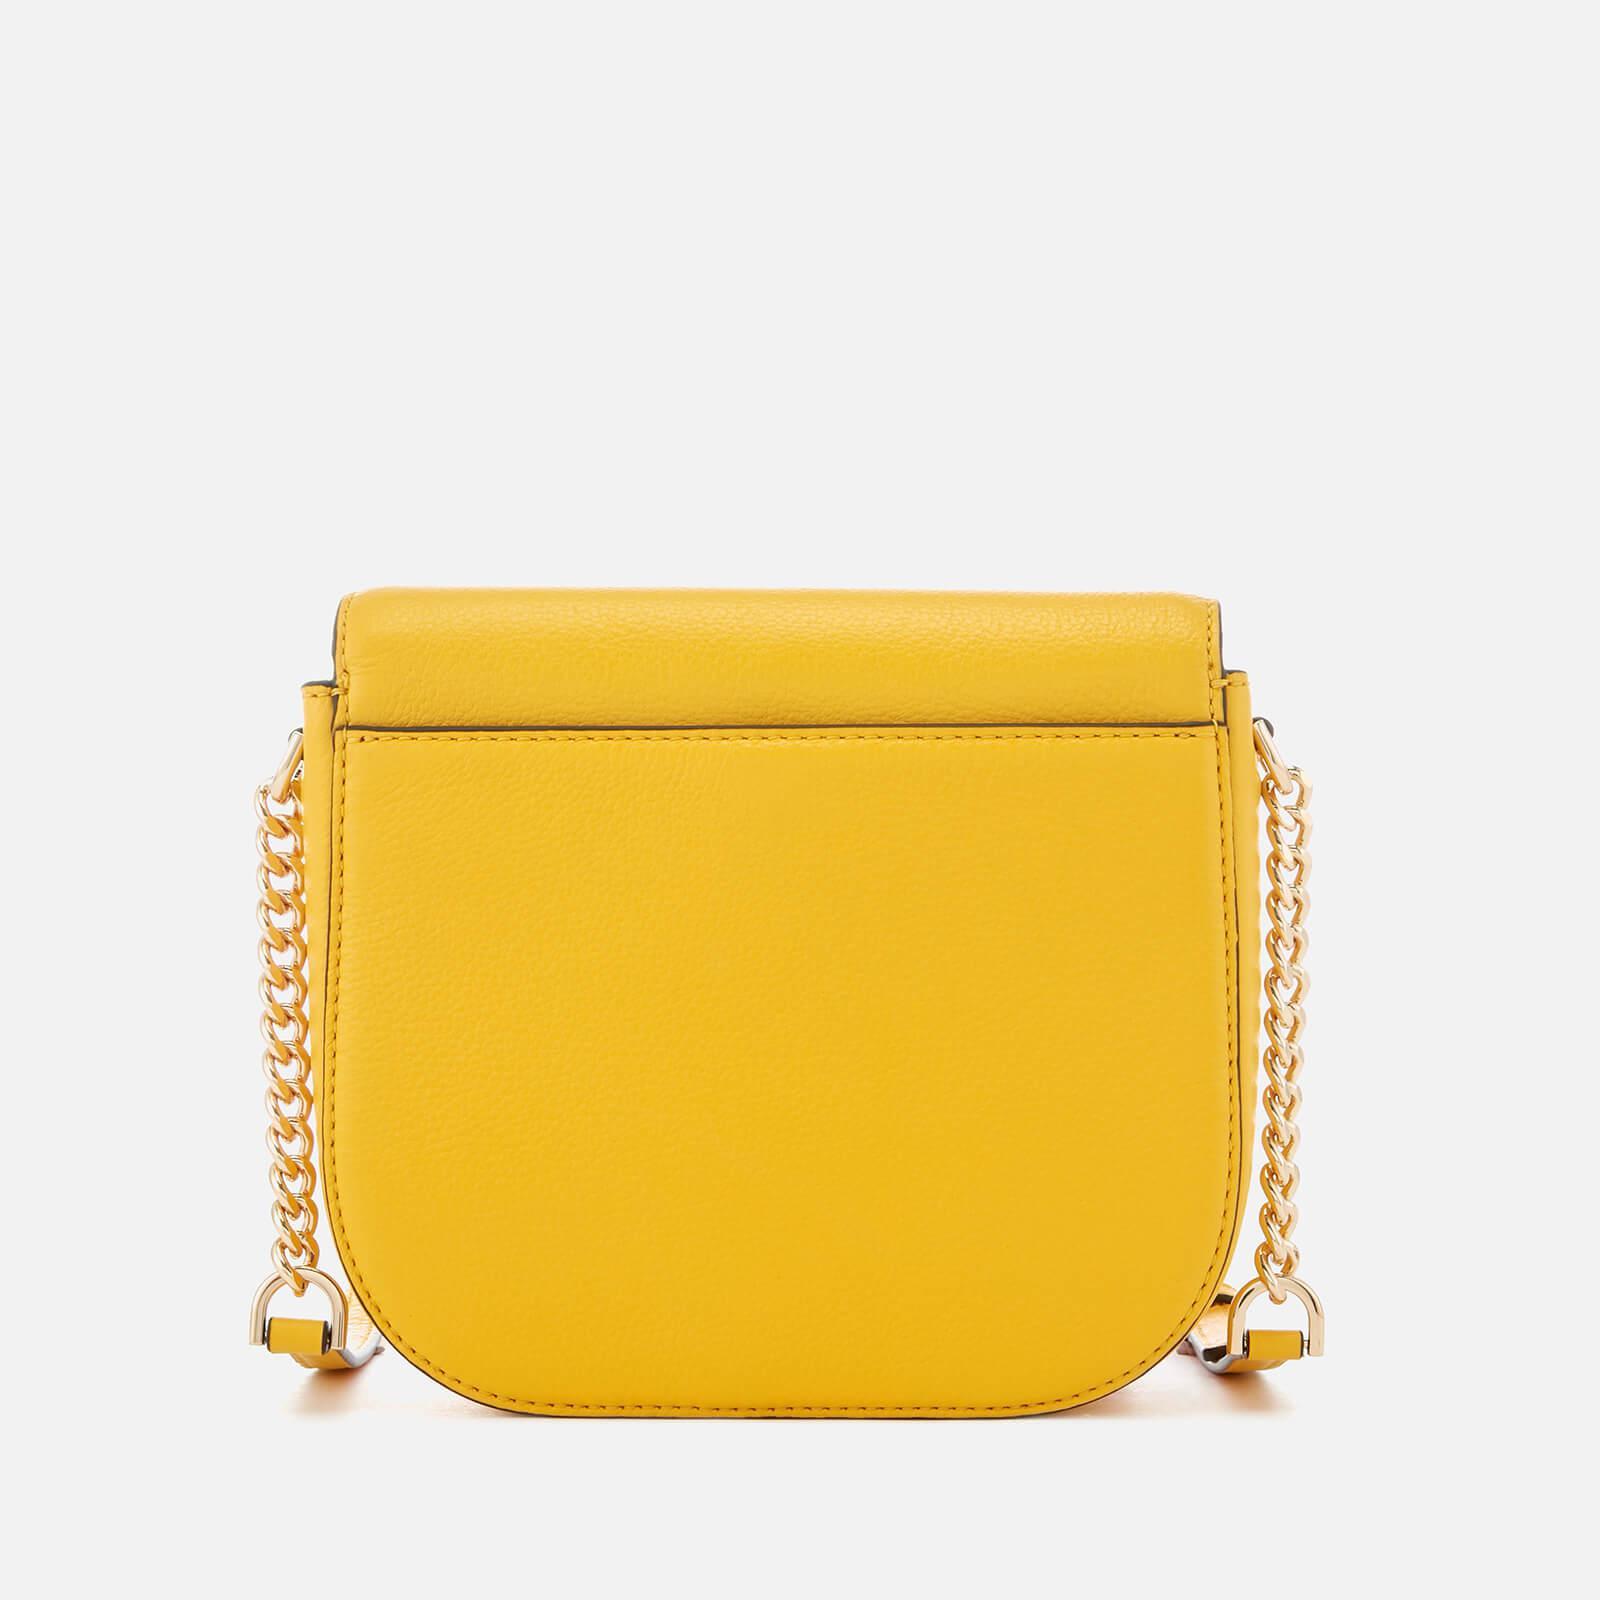 MICHAEL Michael Kors Leather Half Dome Cross Body Bag in Yellow